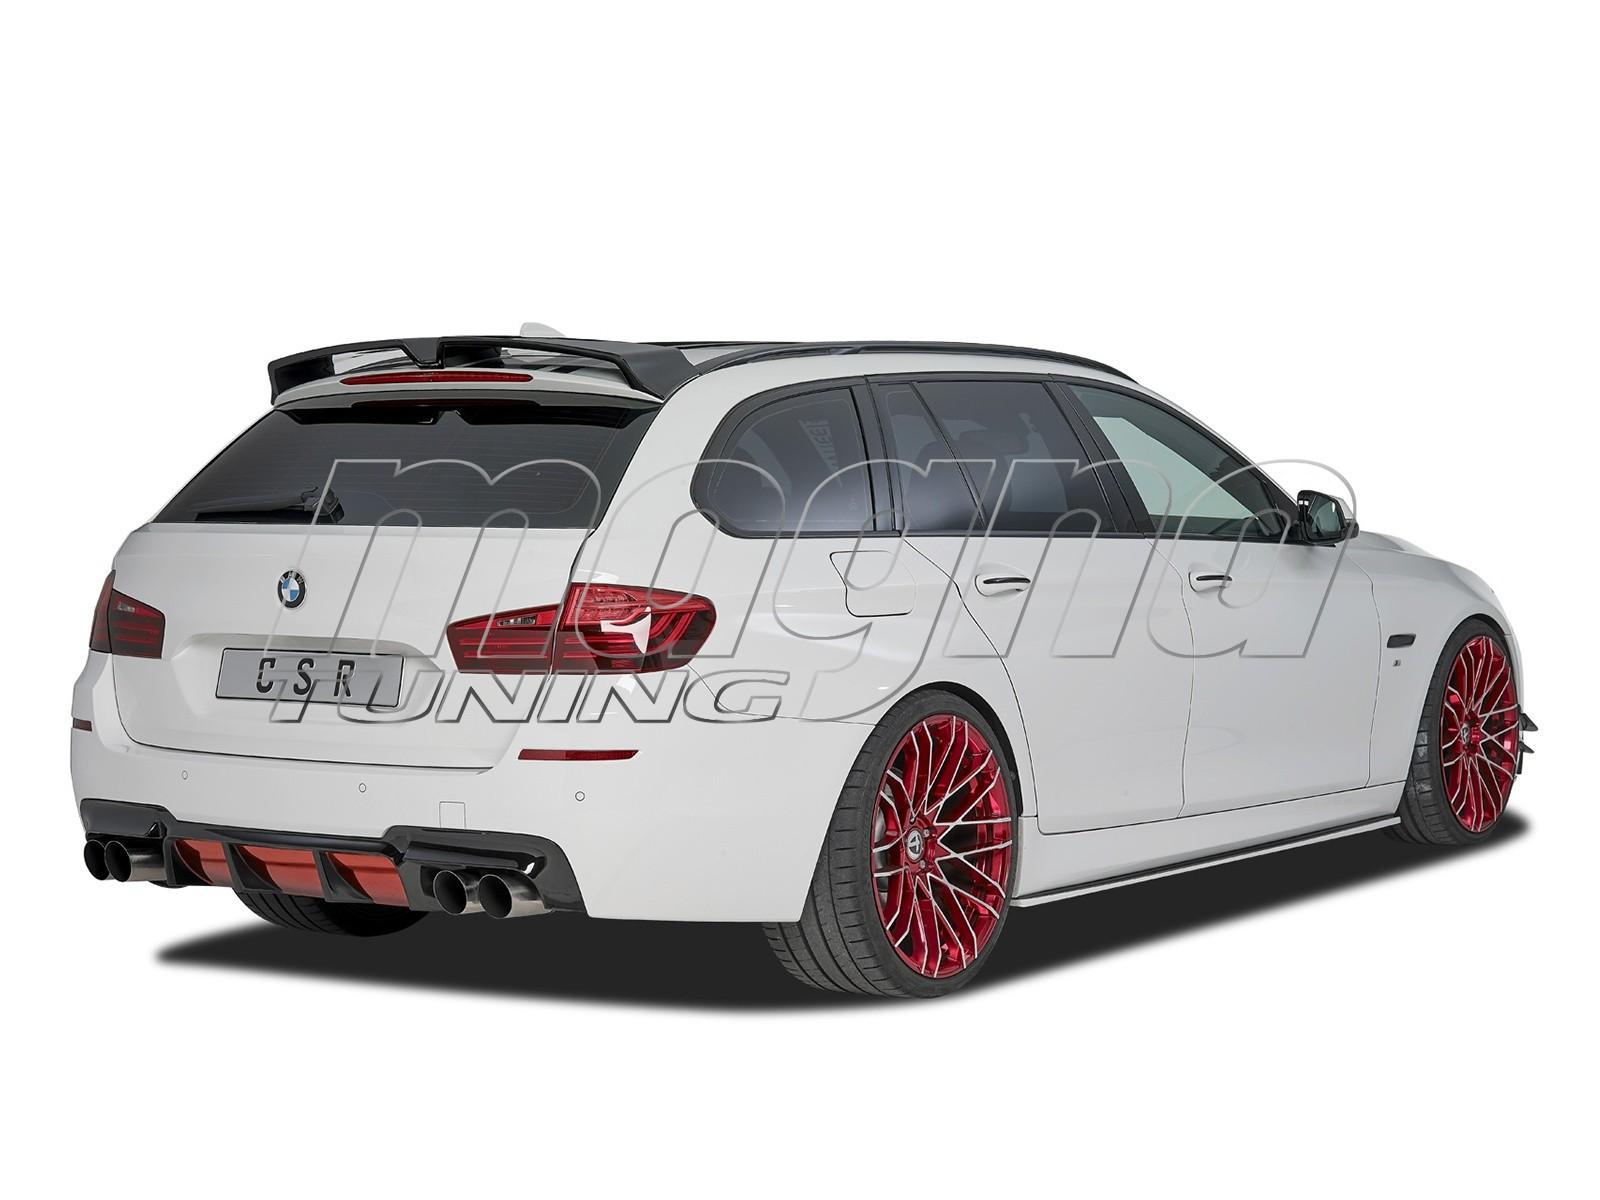 BMW F10 / F11 M-Performance-Look Rear Bumper Extension